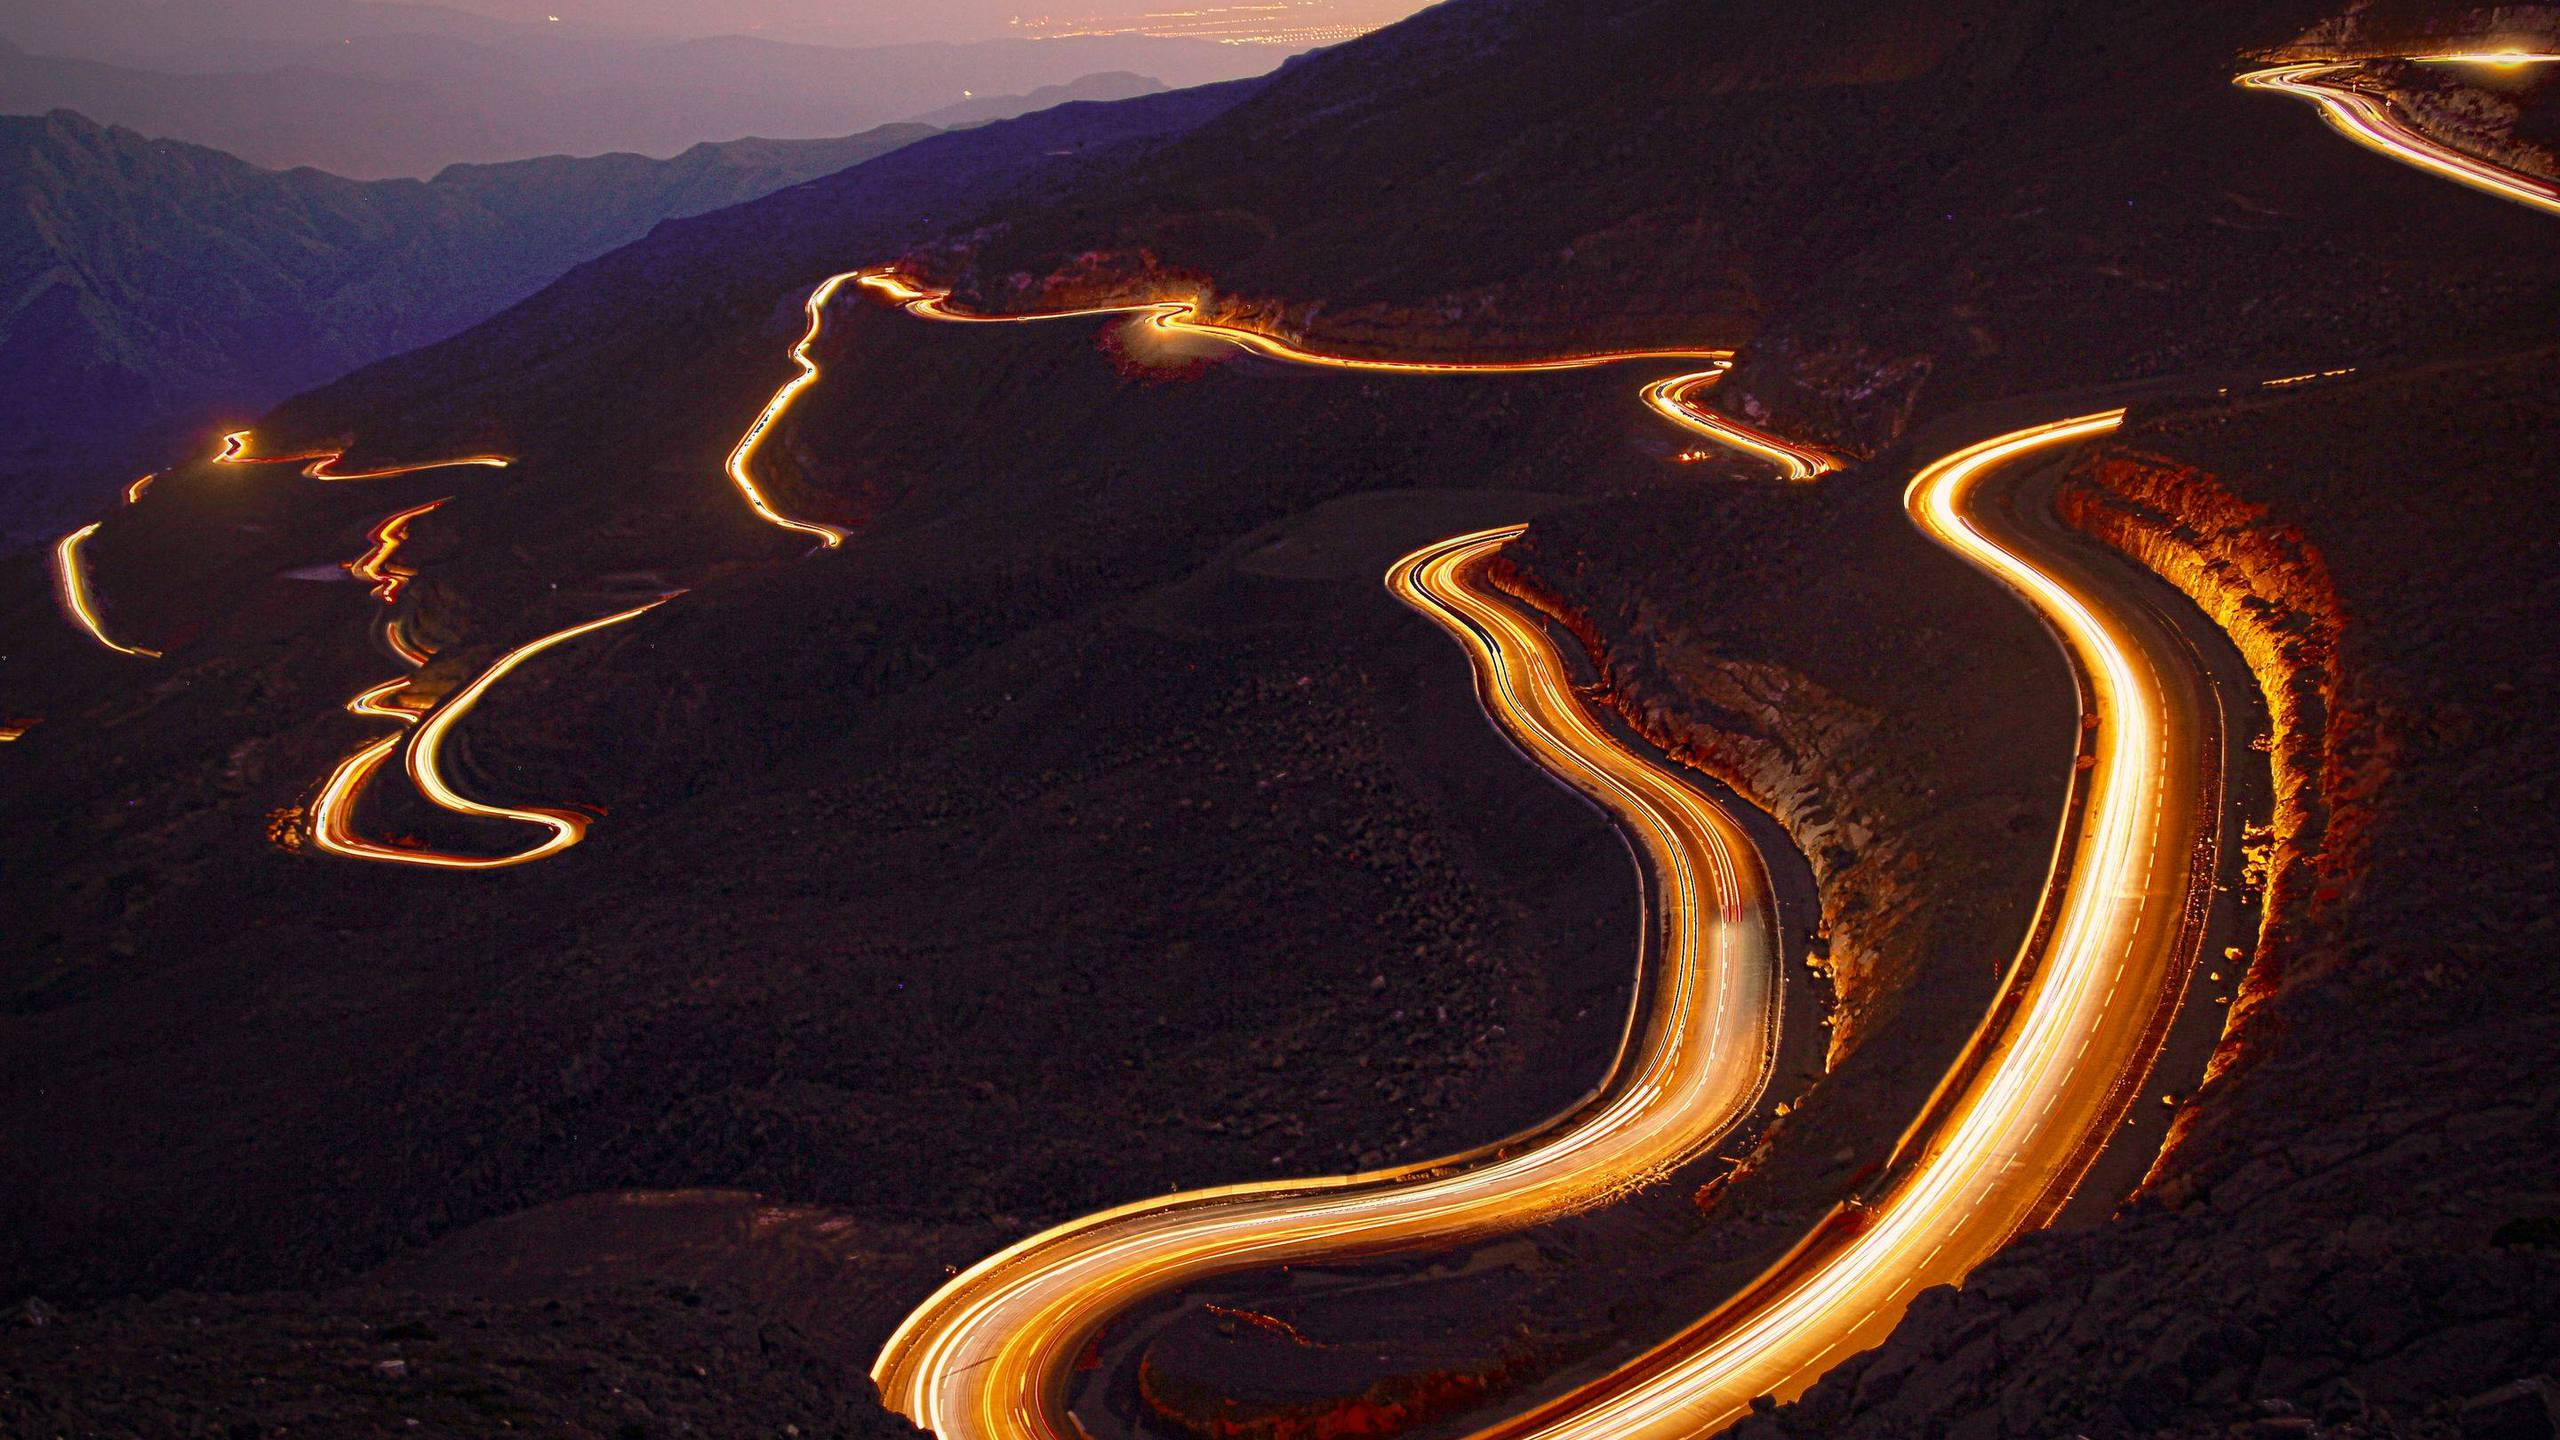 winding roads of Jabal Bil Ays United Arab Emirates iimgurcom 2560x1440